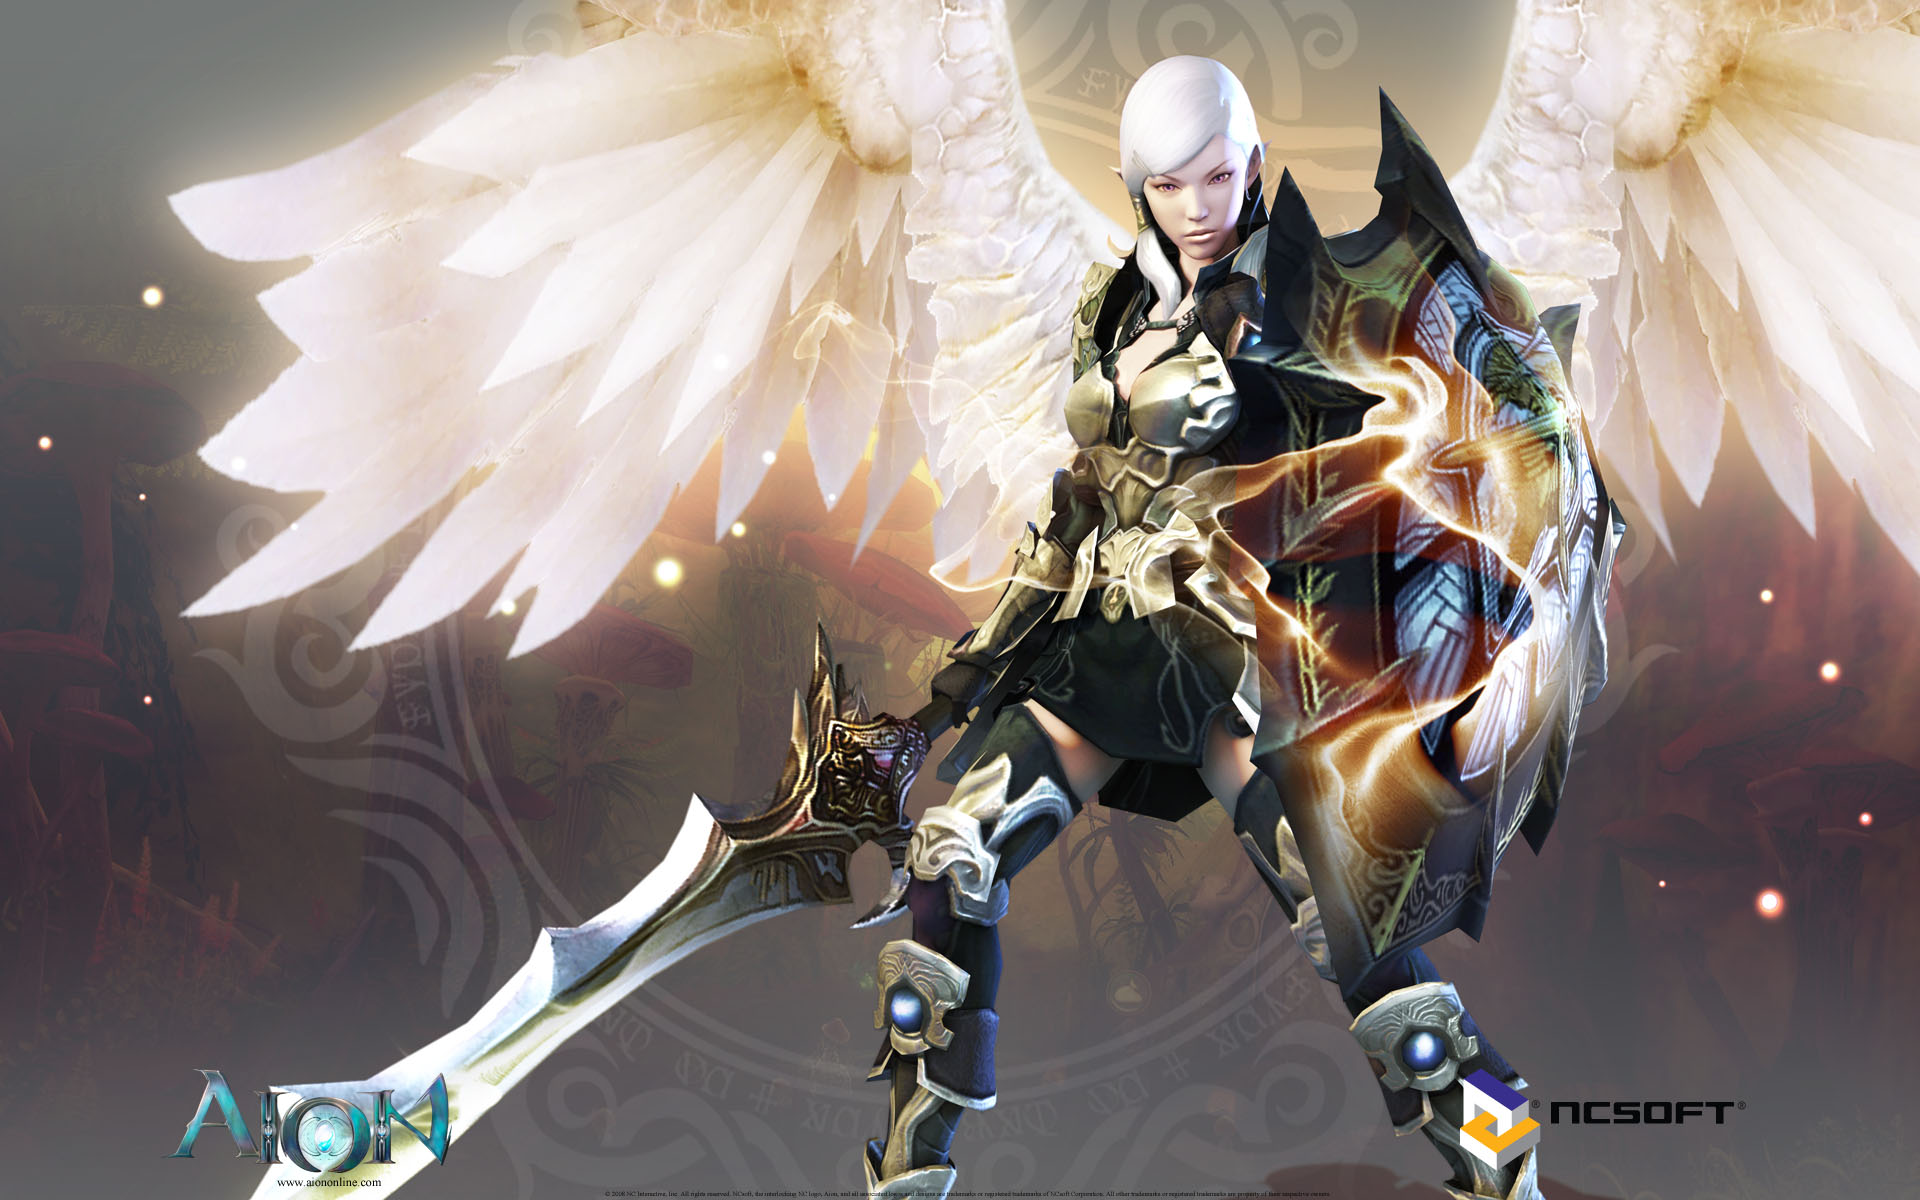 Aion Wallpaper 019 – Elyos Templar